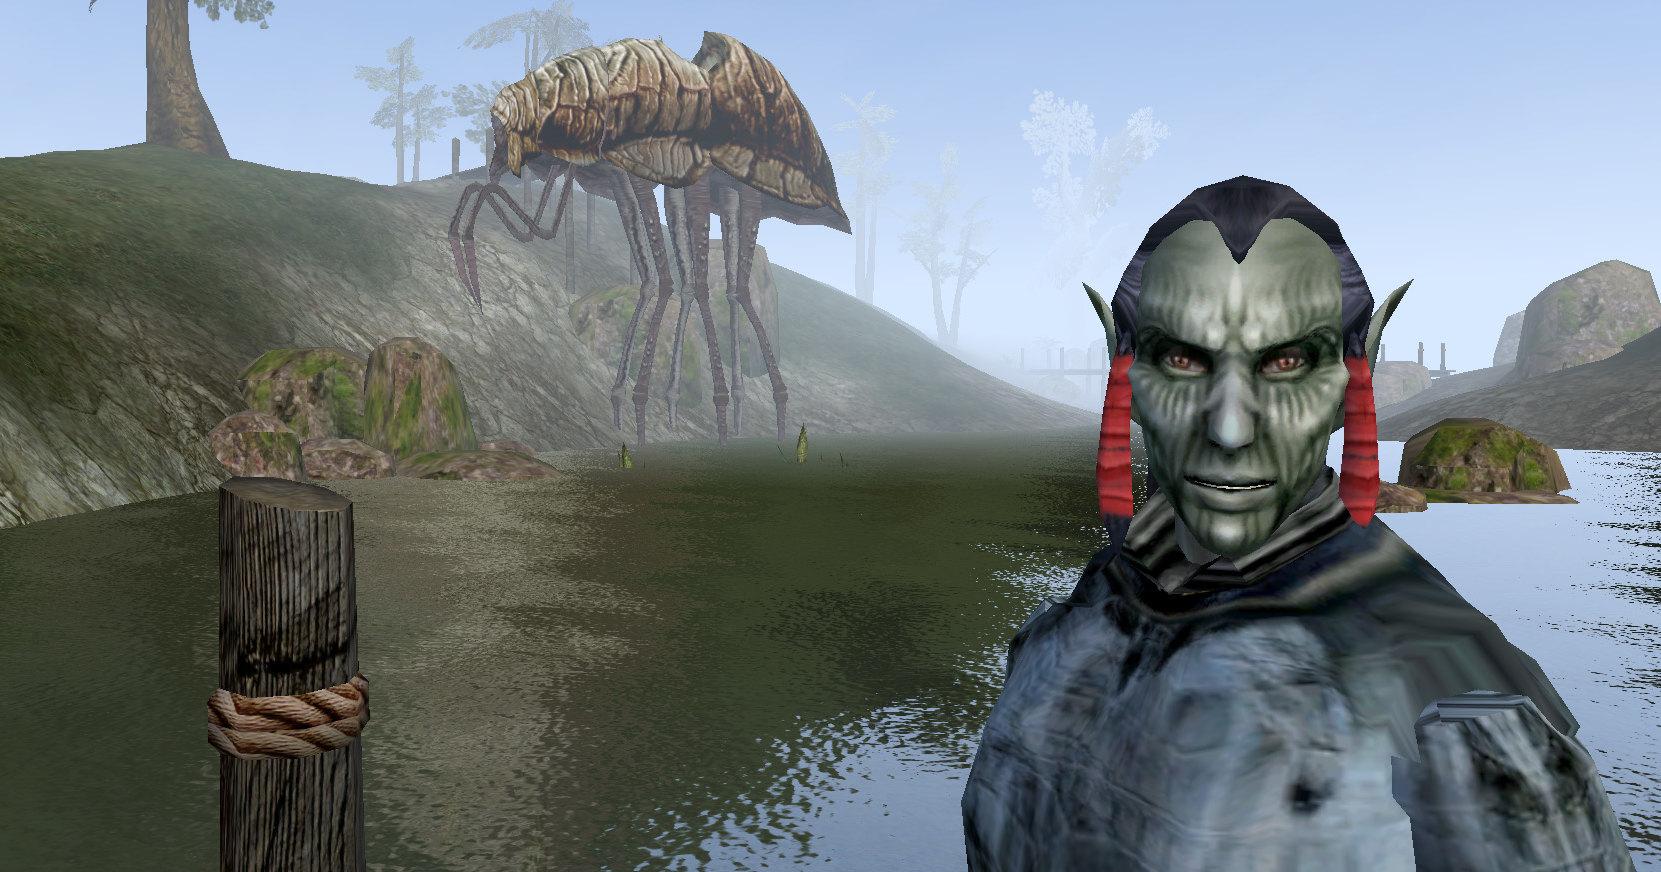 На «Эльбрусе» запустили Counter-Strike и Morrowind